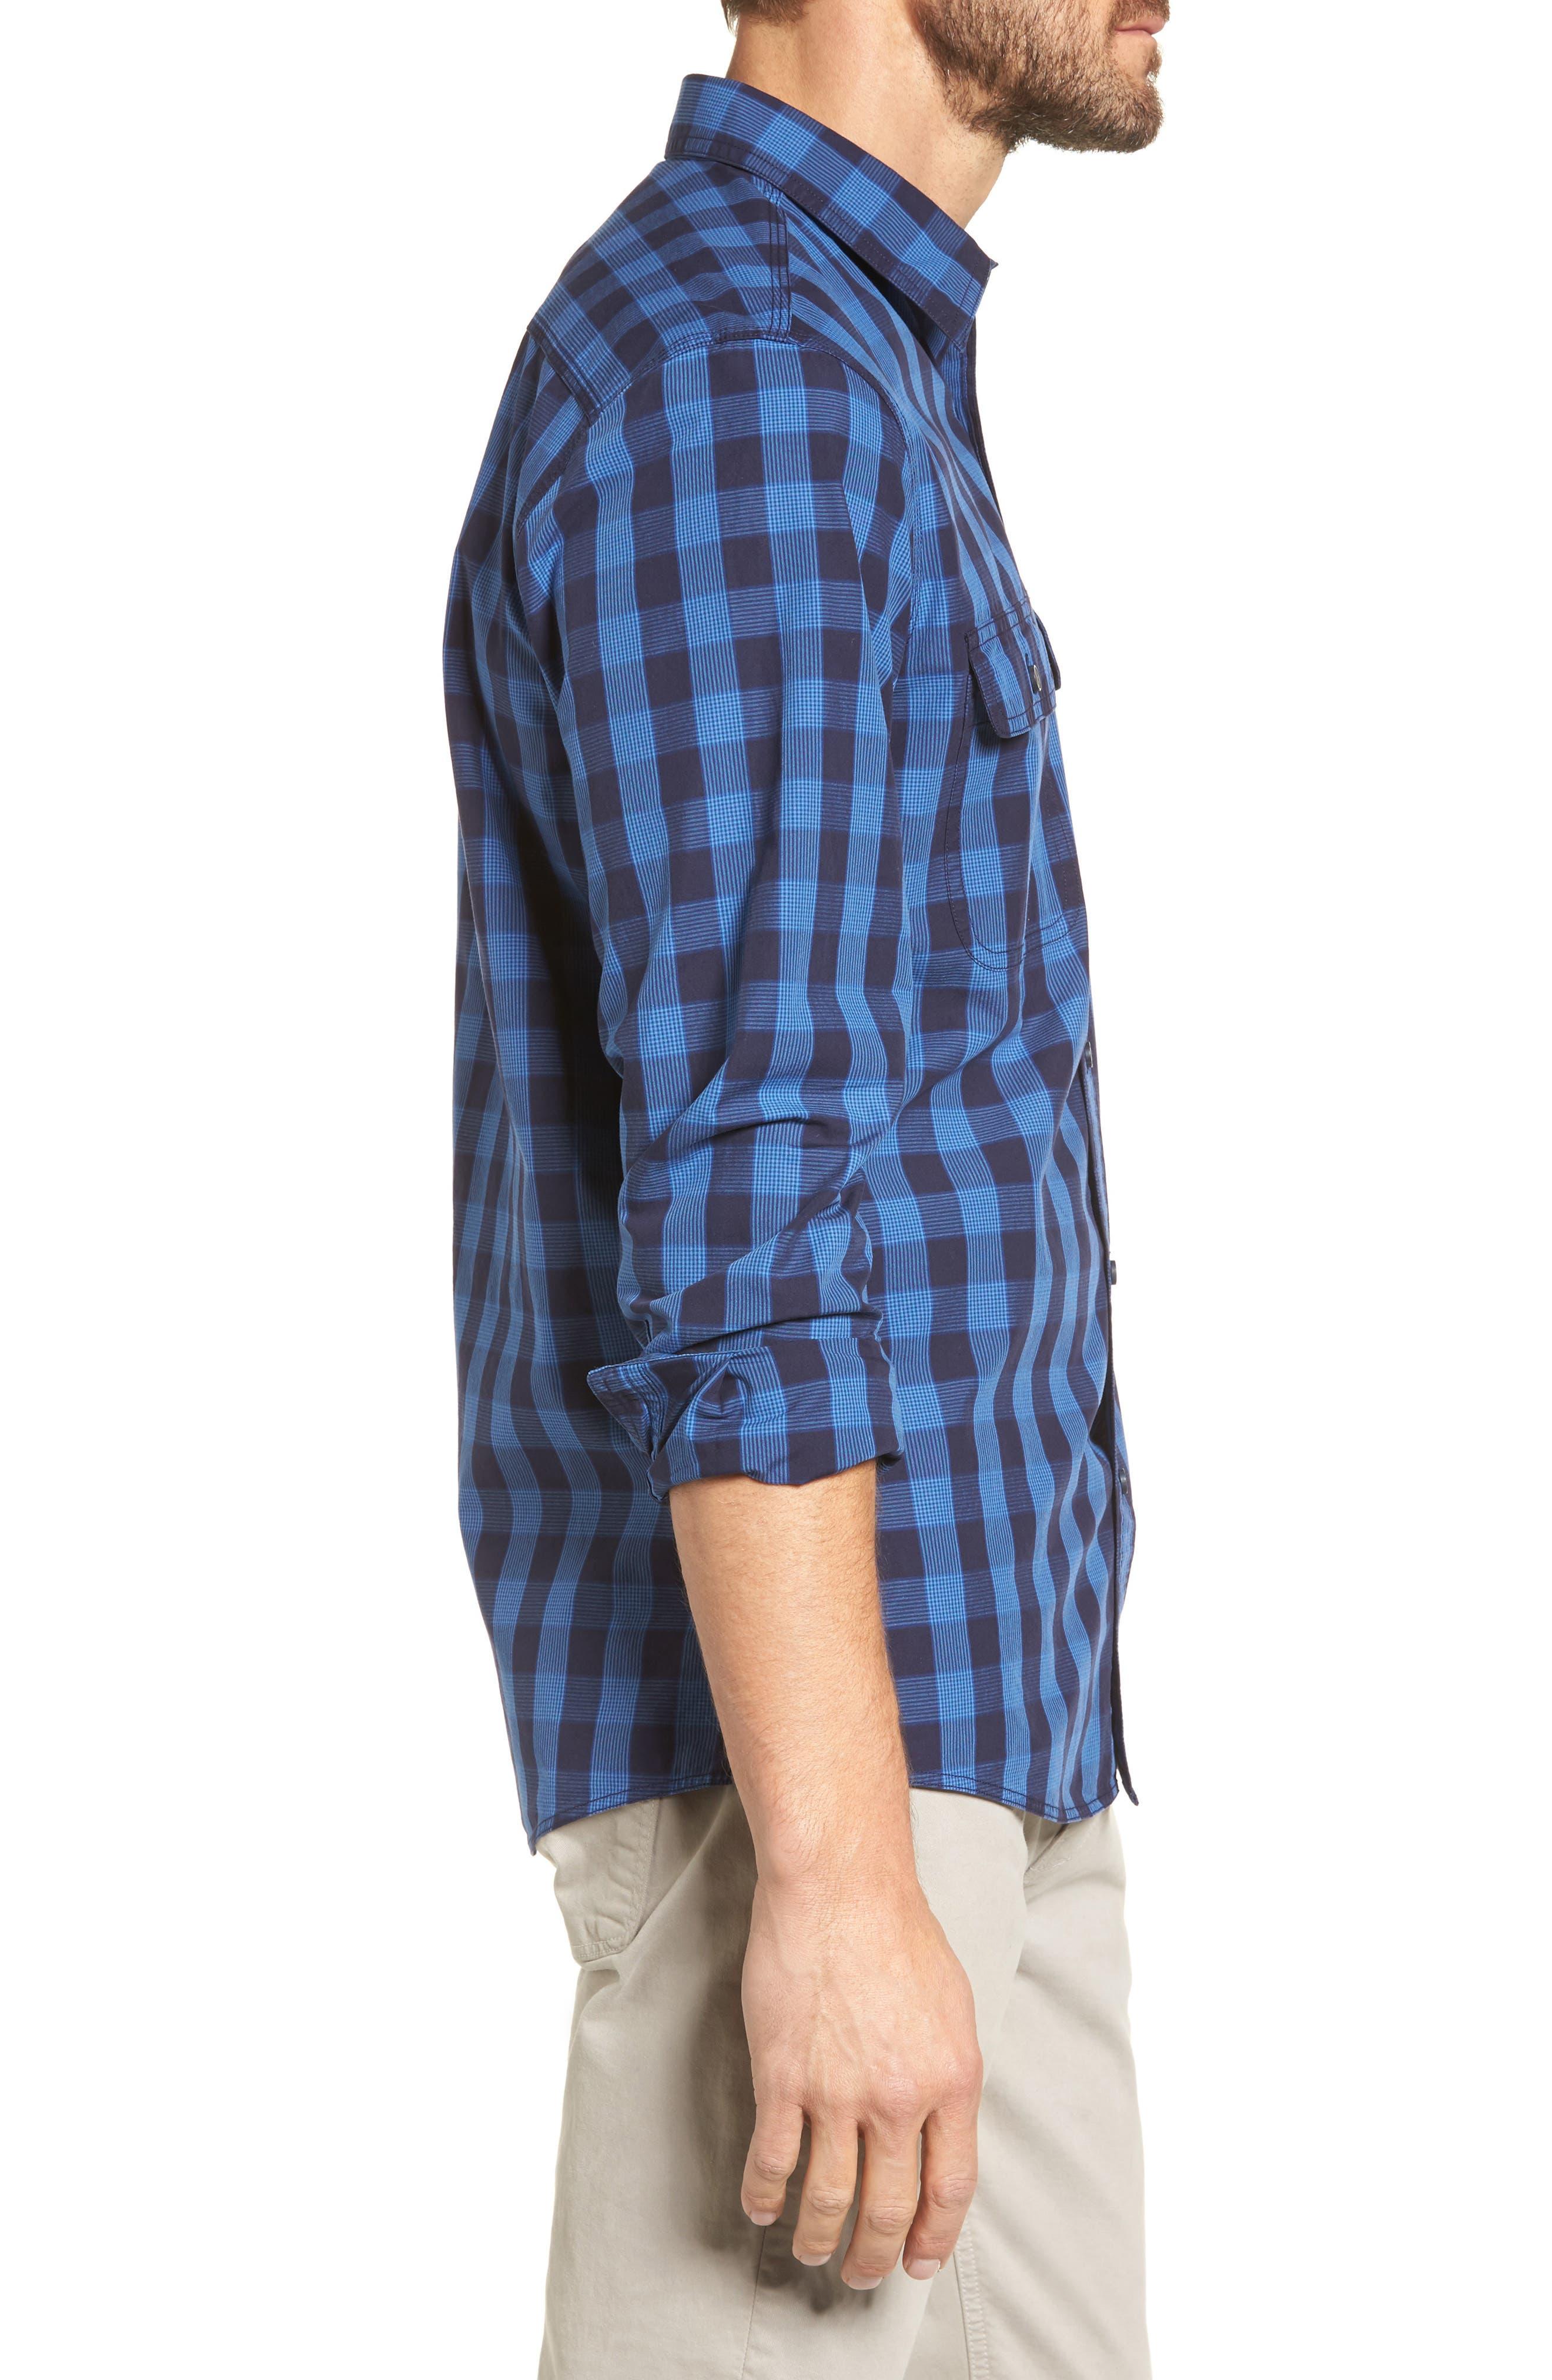 Trim Fit Plaid Trucker Sport Shirt,                             Alternate thumbnail 4, color,                             Navy Iris Blue Check